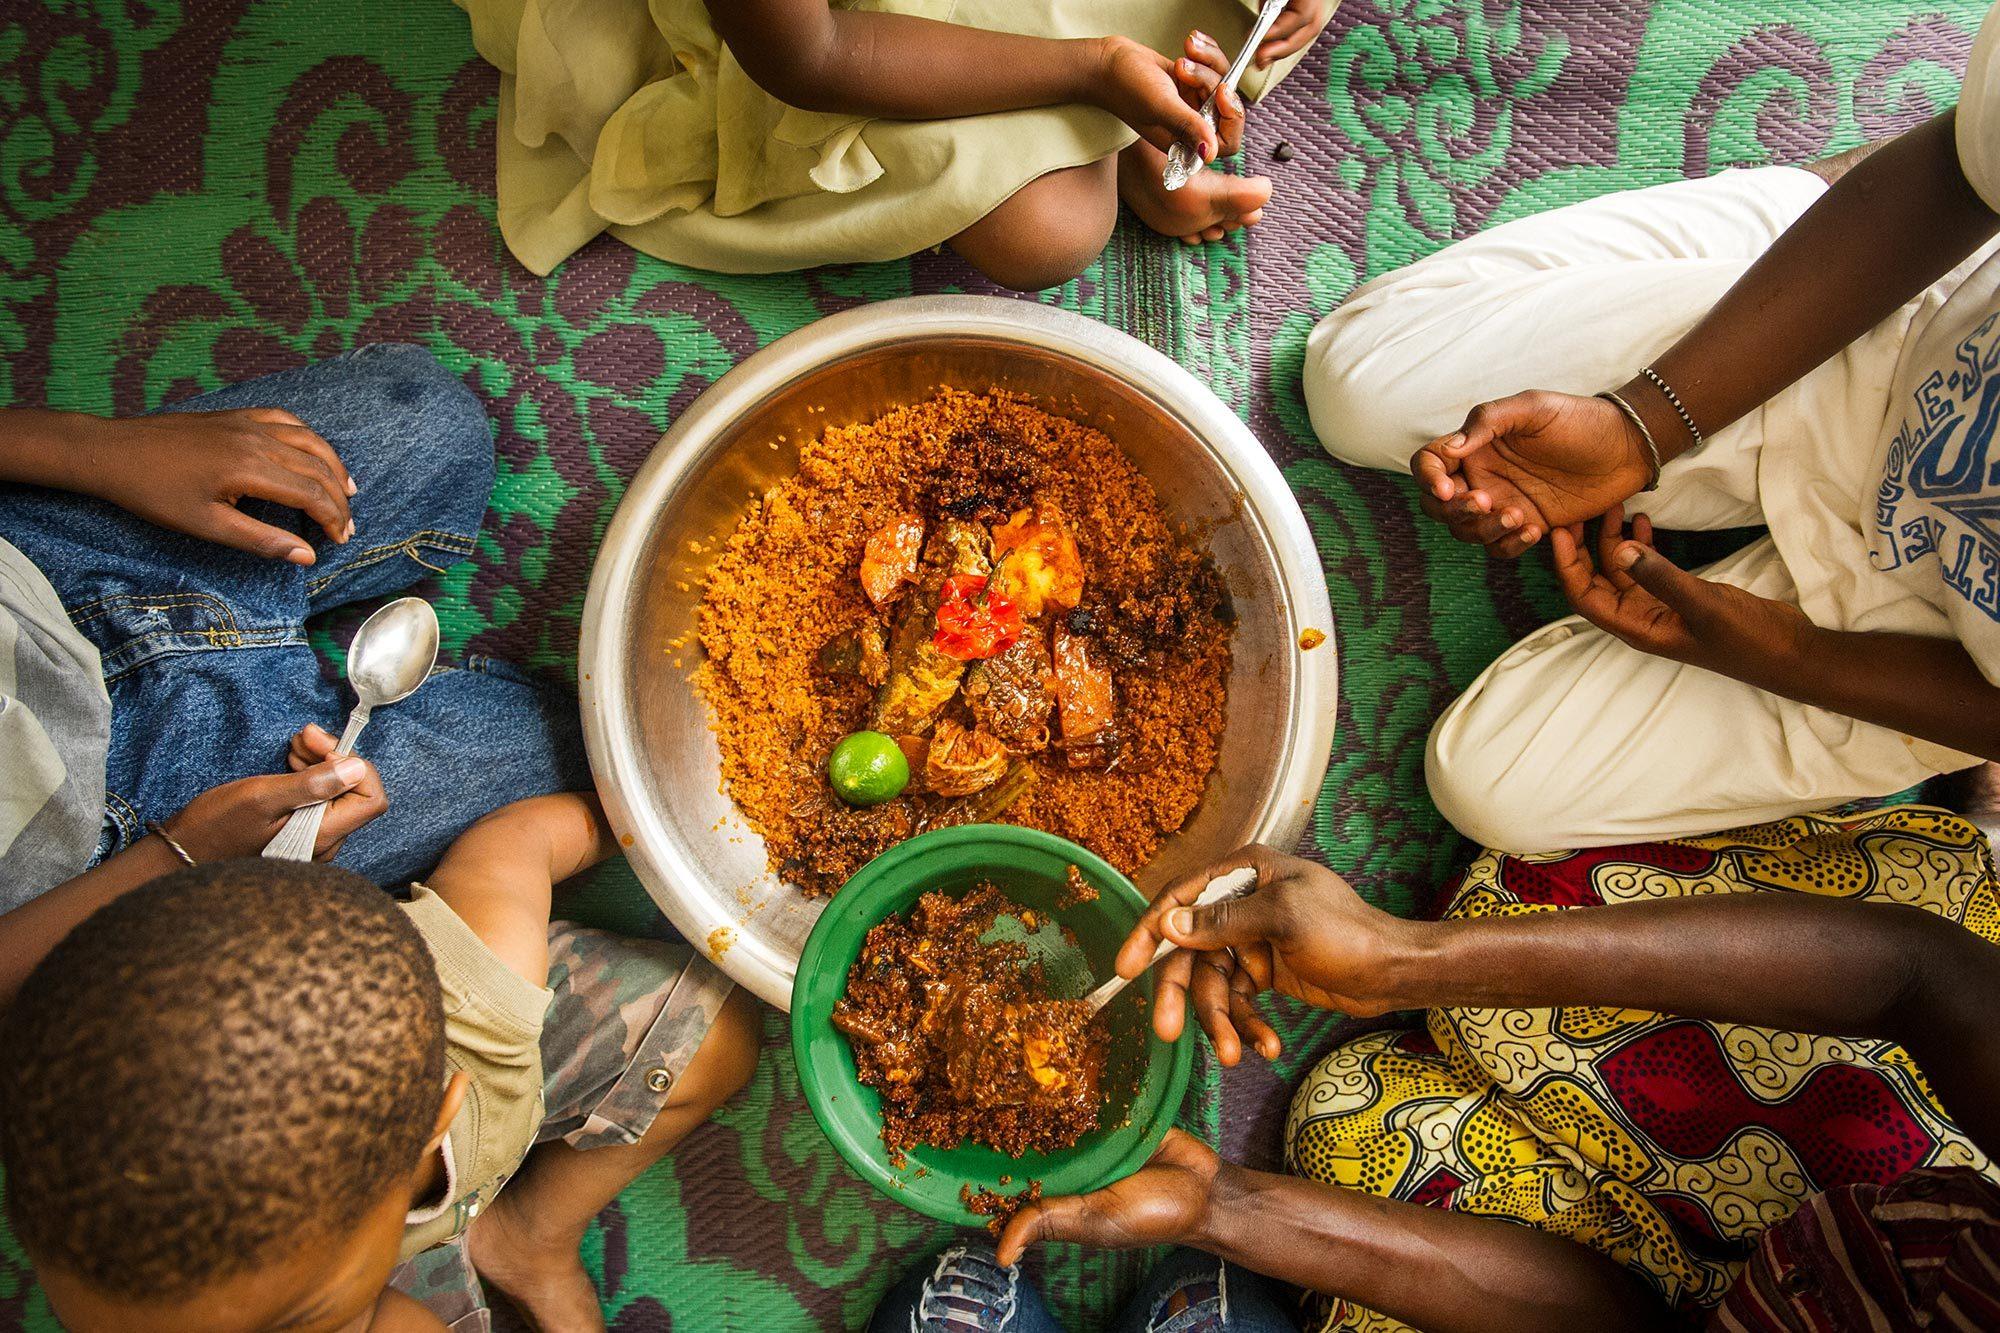 Article-New-African-Ingredients-Pantry-Iya-Basbaas-Makomas-Yolele-Egunsi-Foods-EssieSpice-Nafis